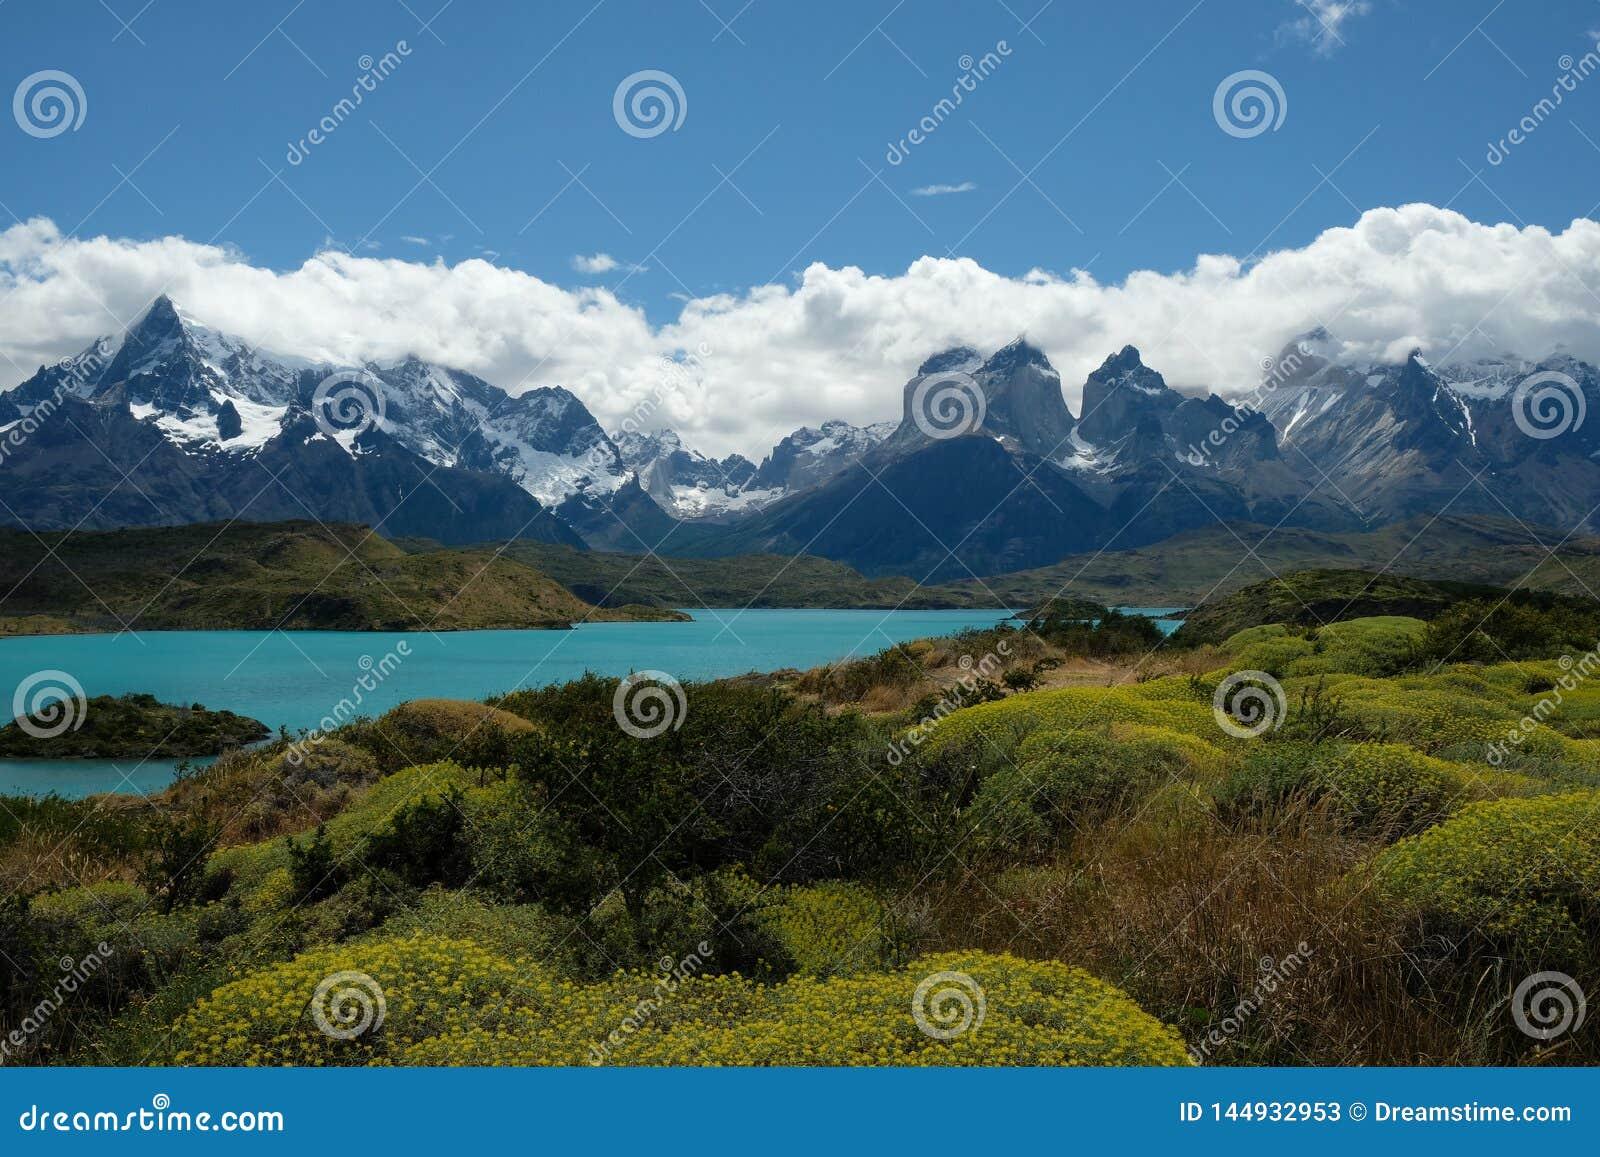 Paisaje de Torres del Paine, Patagonia, Chile